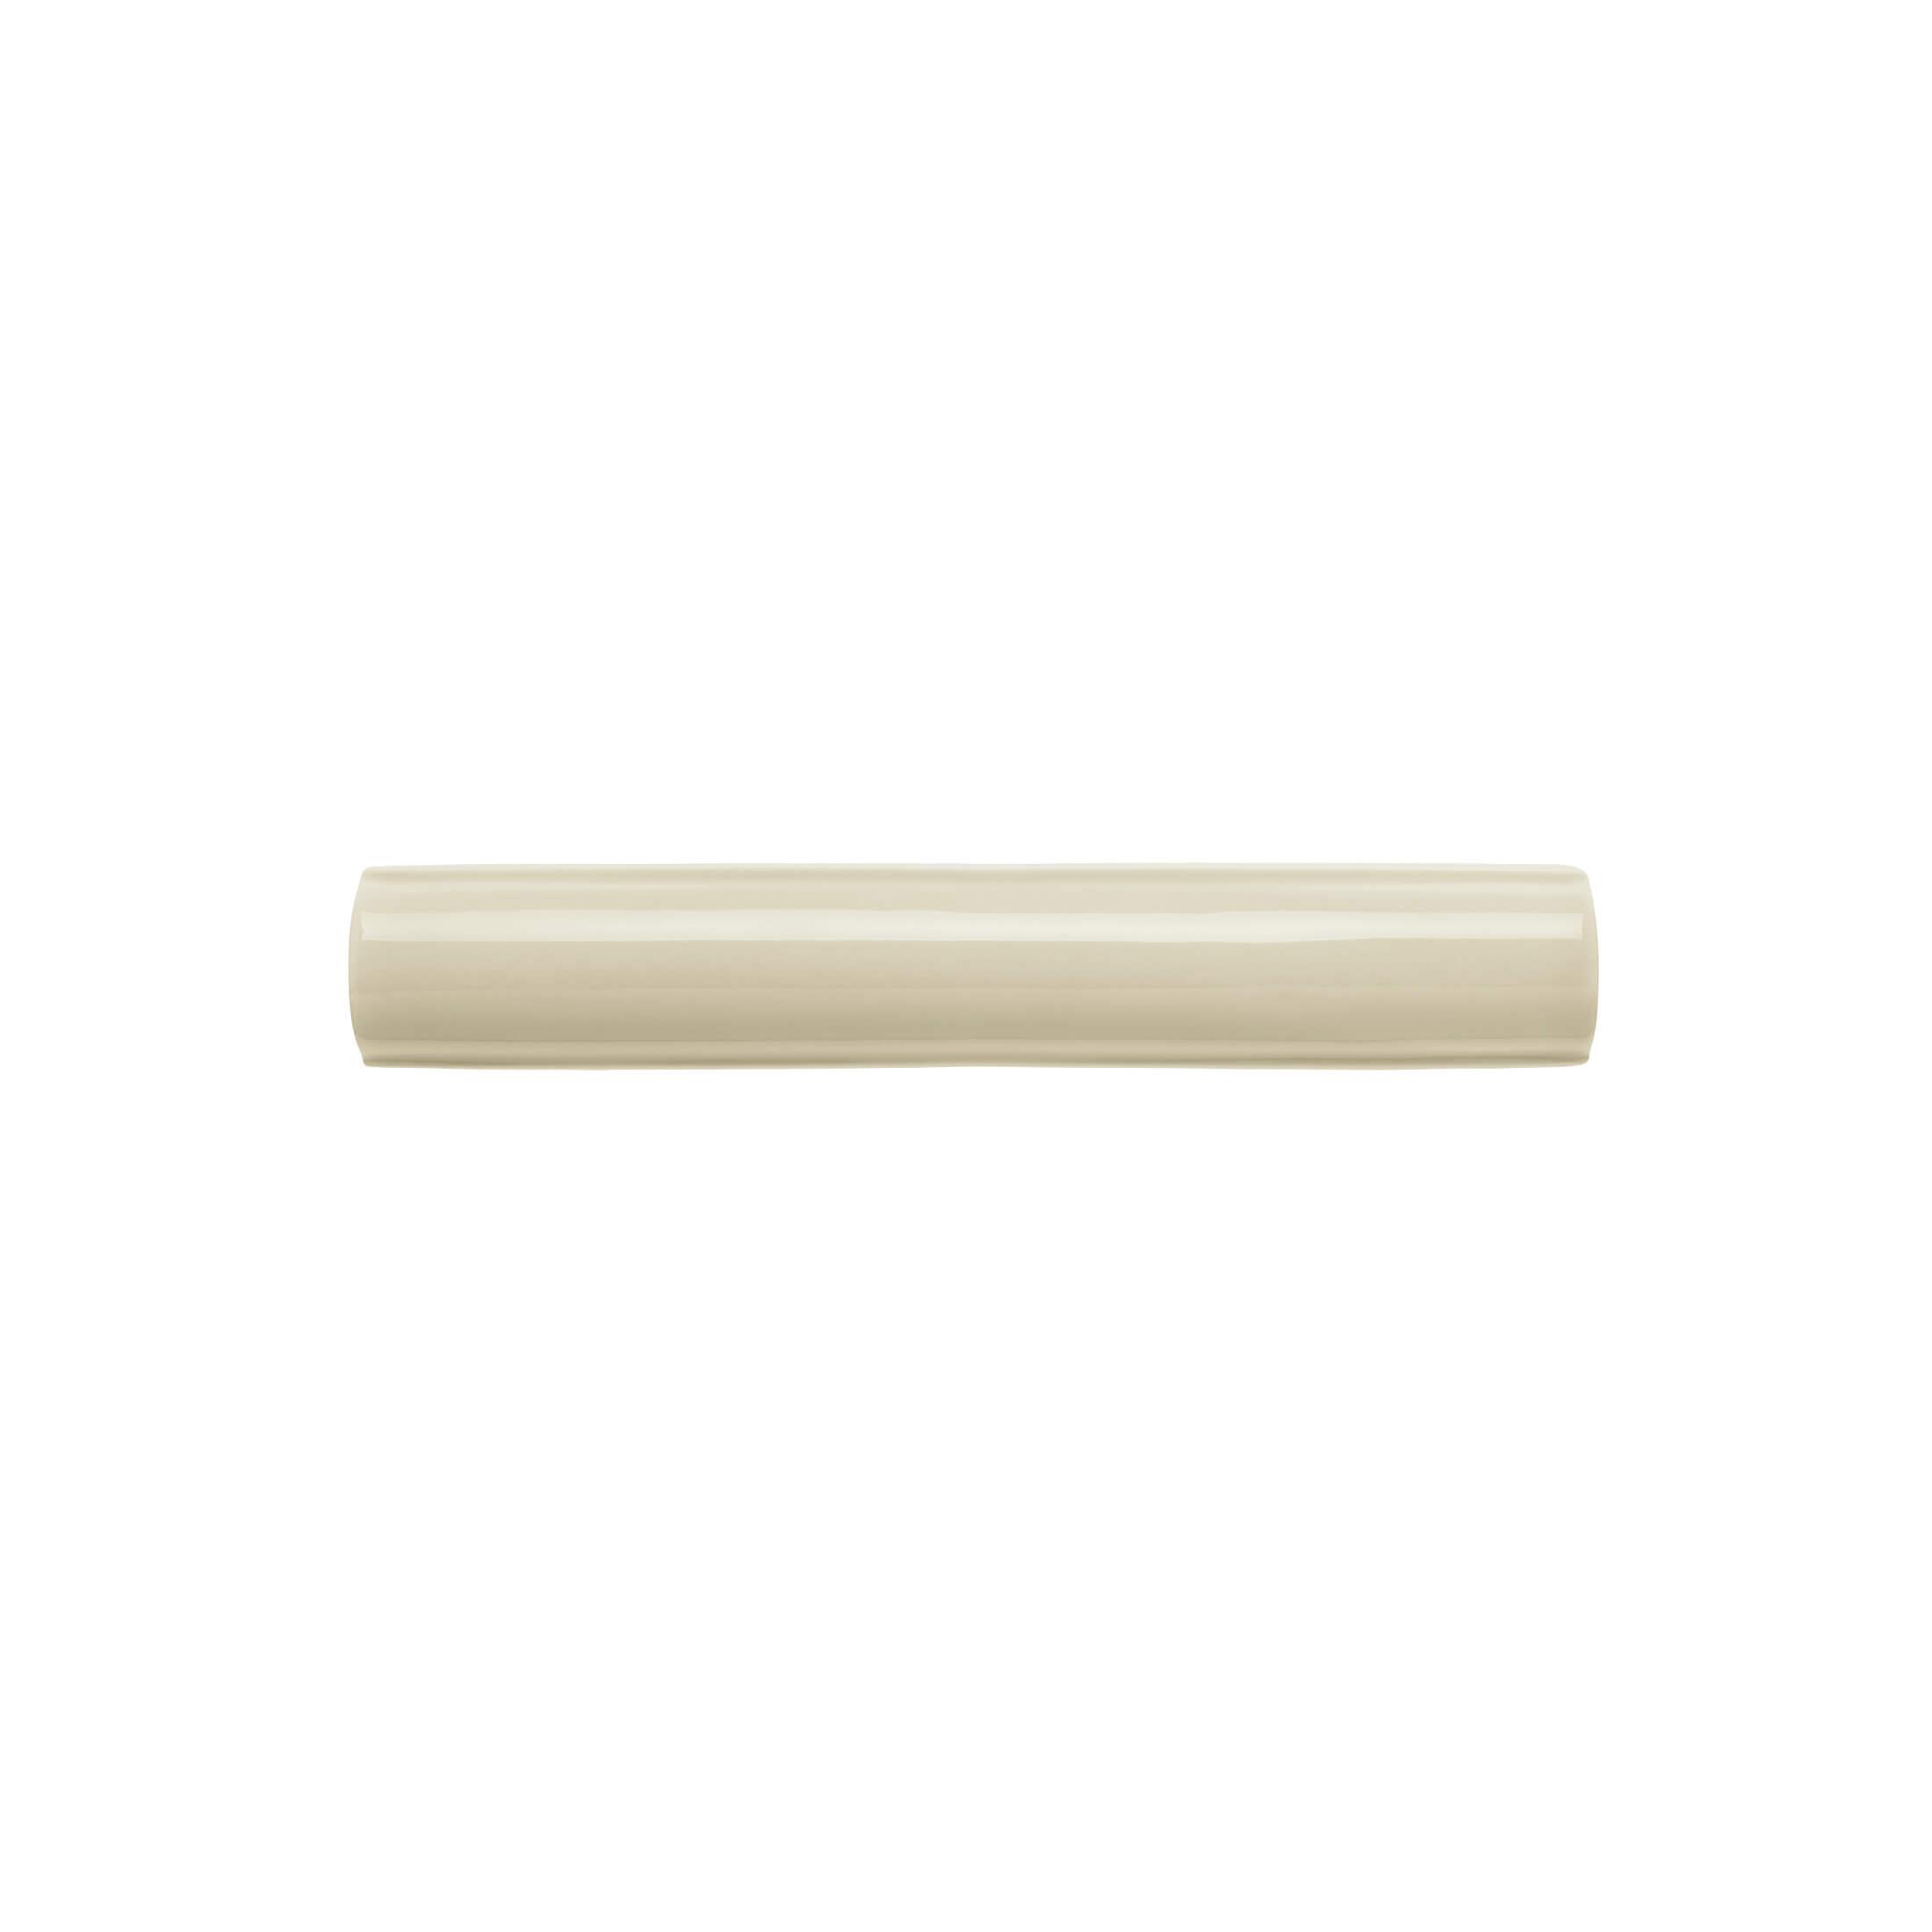 ADNE4139 - BARRA LISA - 3 cm X 20 cm